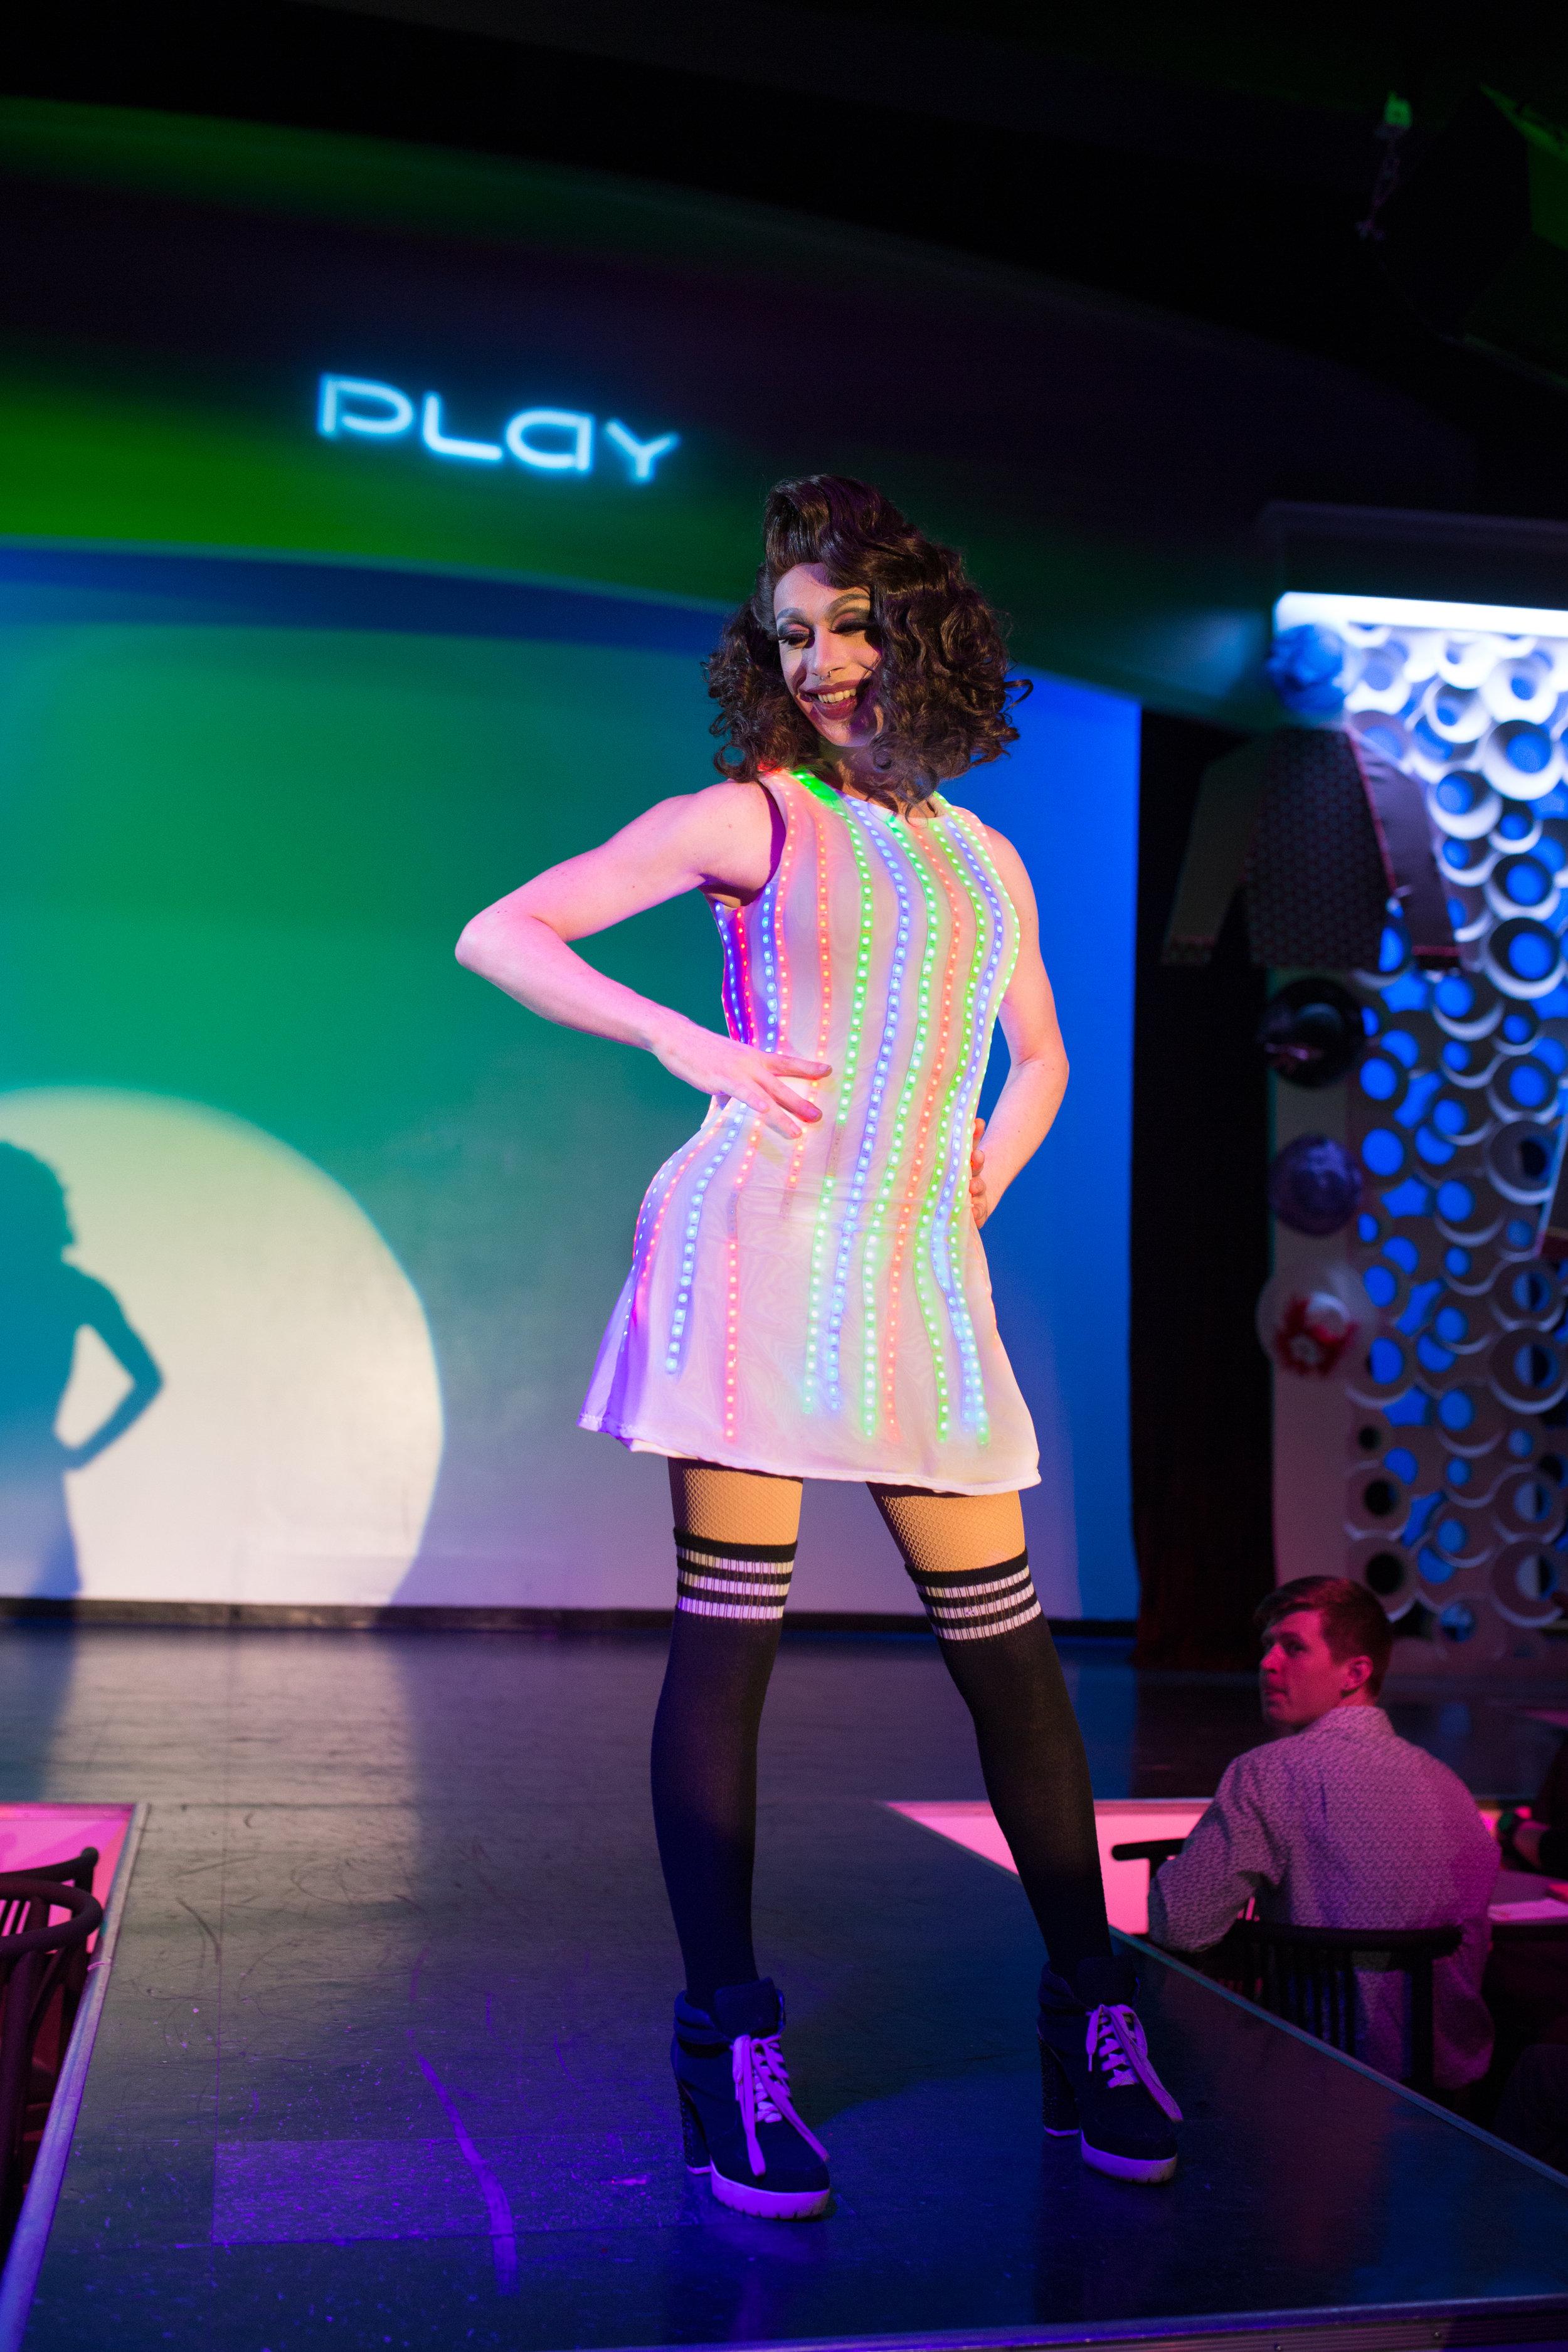 Rainbows & Roses Thurby 2017 WEBSITE FEVA PLAY Crystal Ludwick Photo 69.jpg